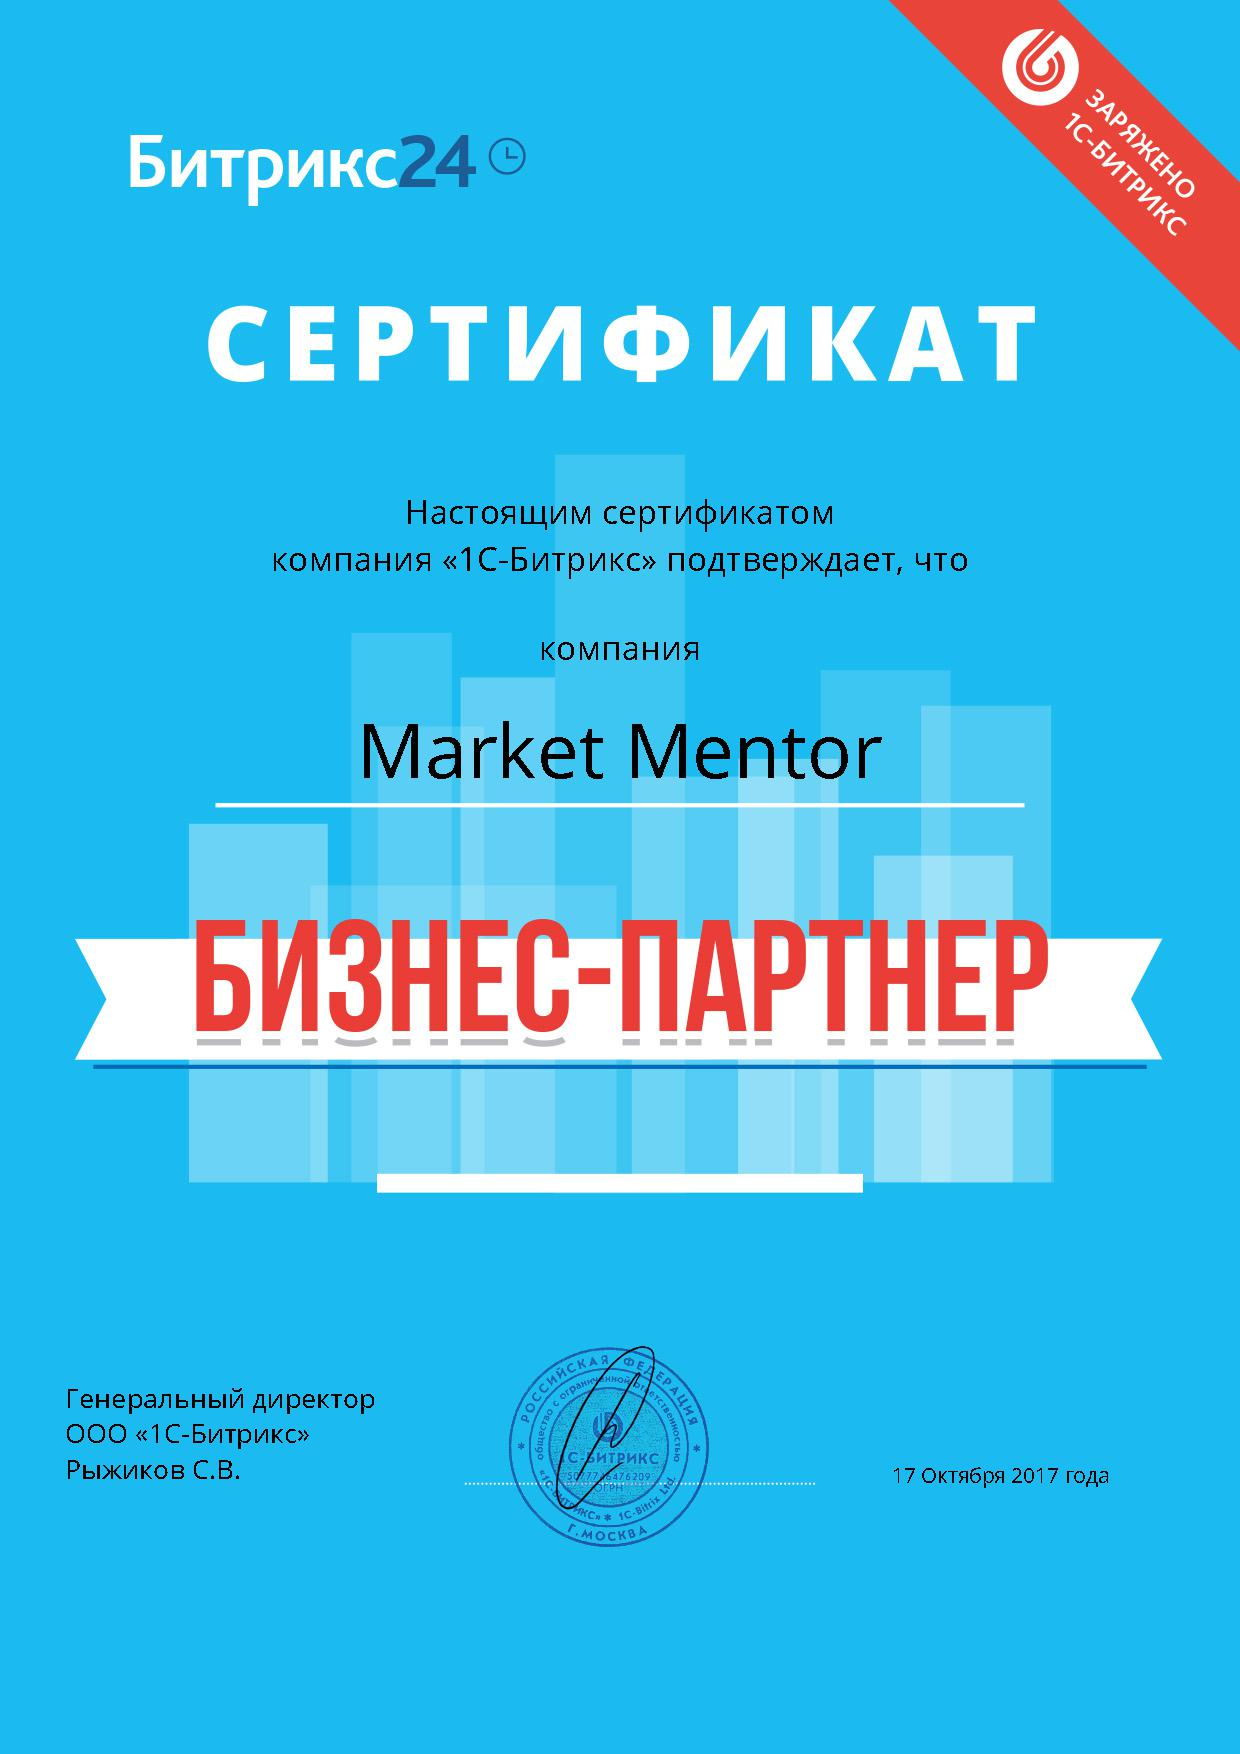 5de597c60 Скидки читателям National Business